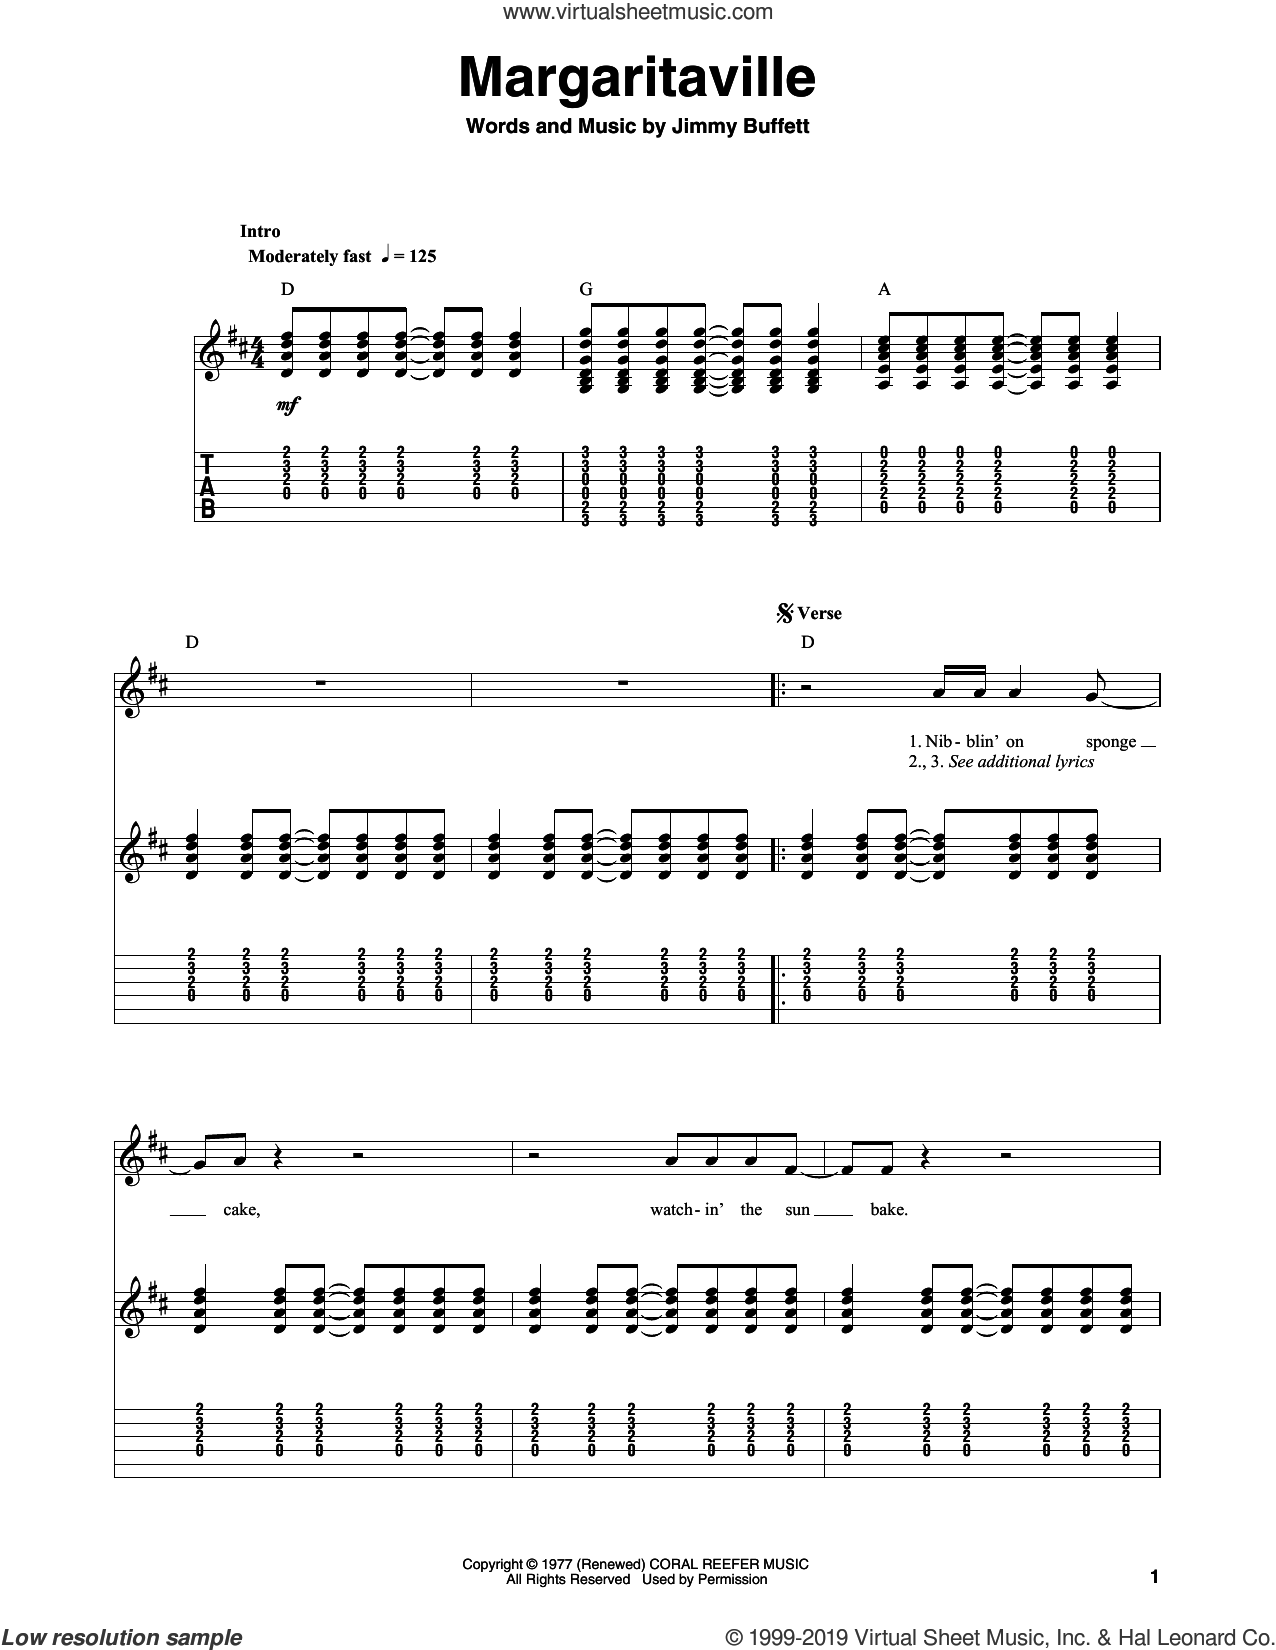 Margaritaville sheet music for guitar (tablature, play-along) by Jimmy Buffett, intermediate skill level